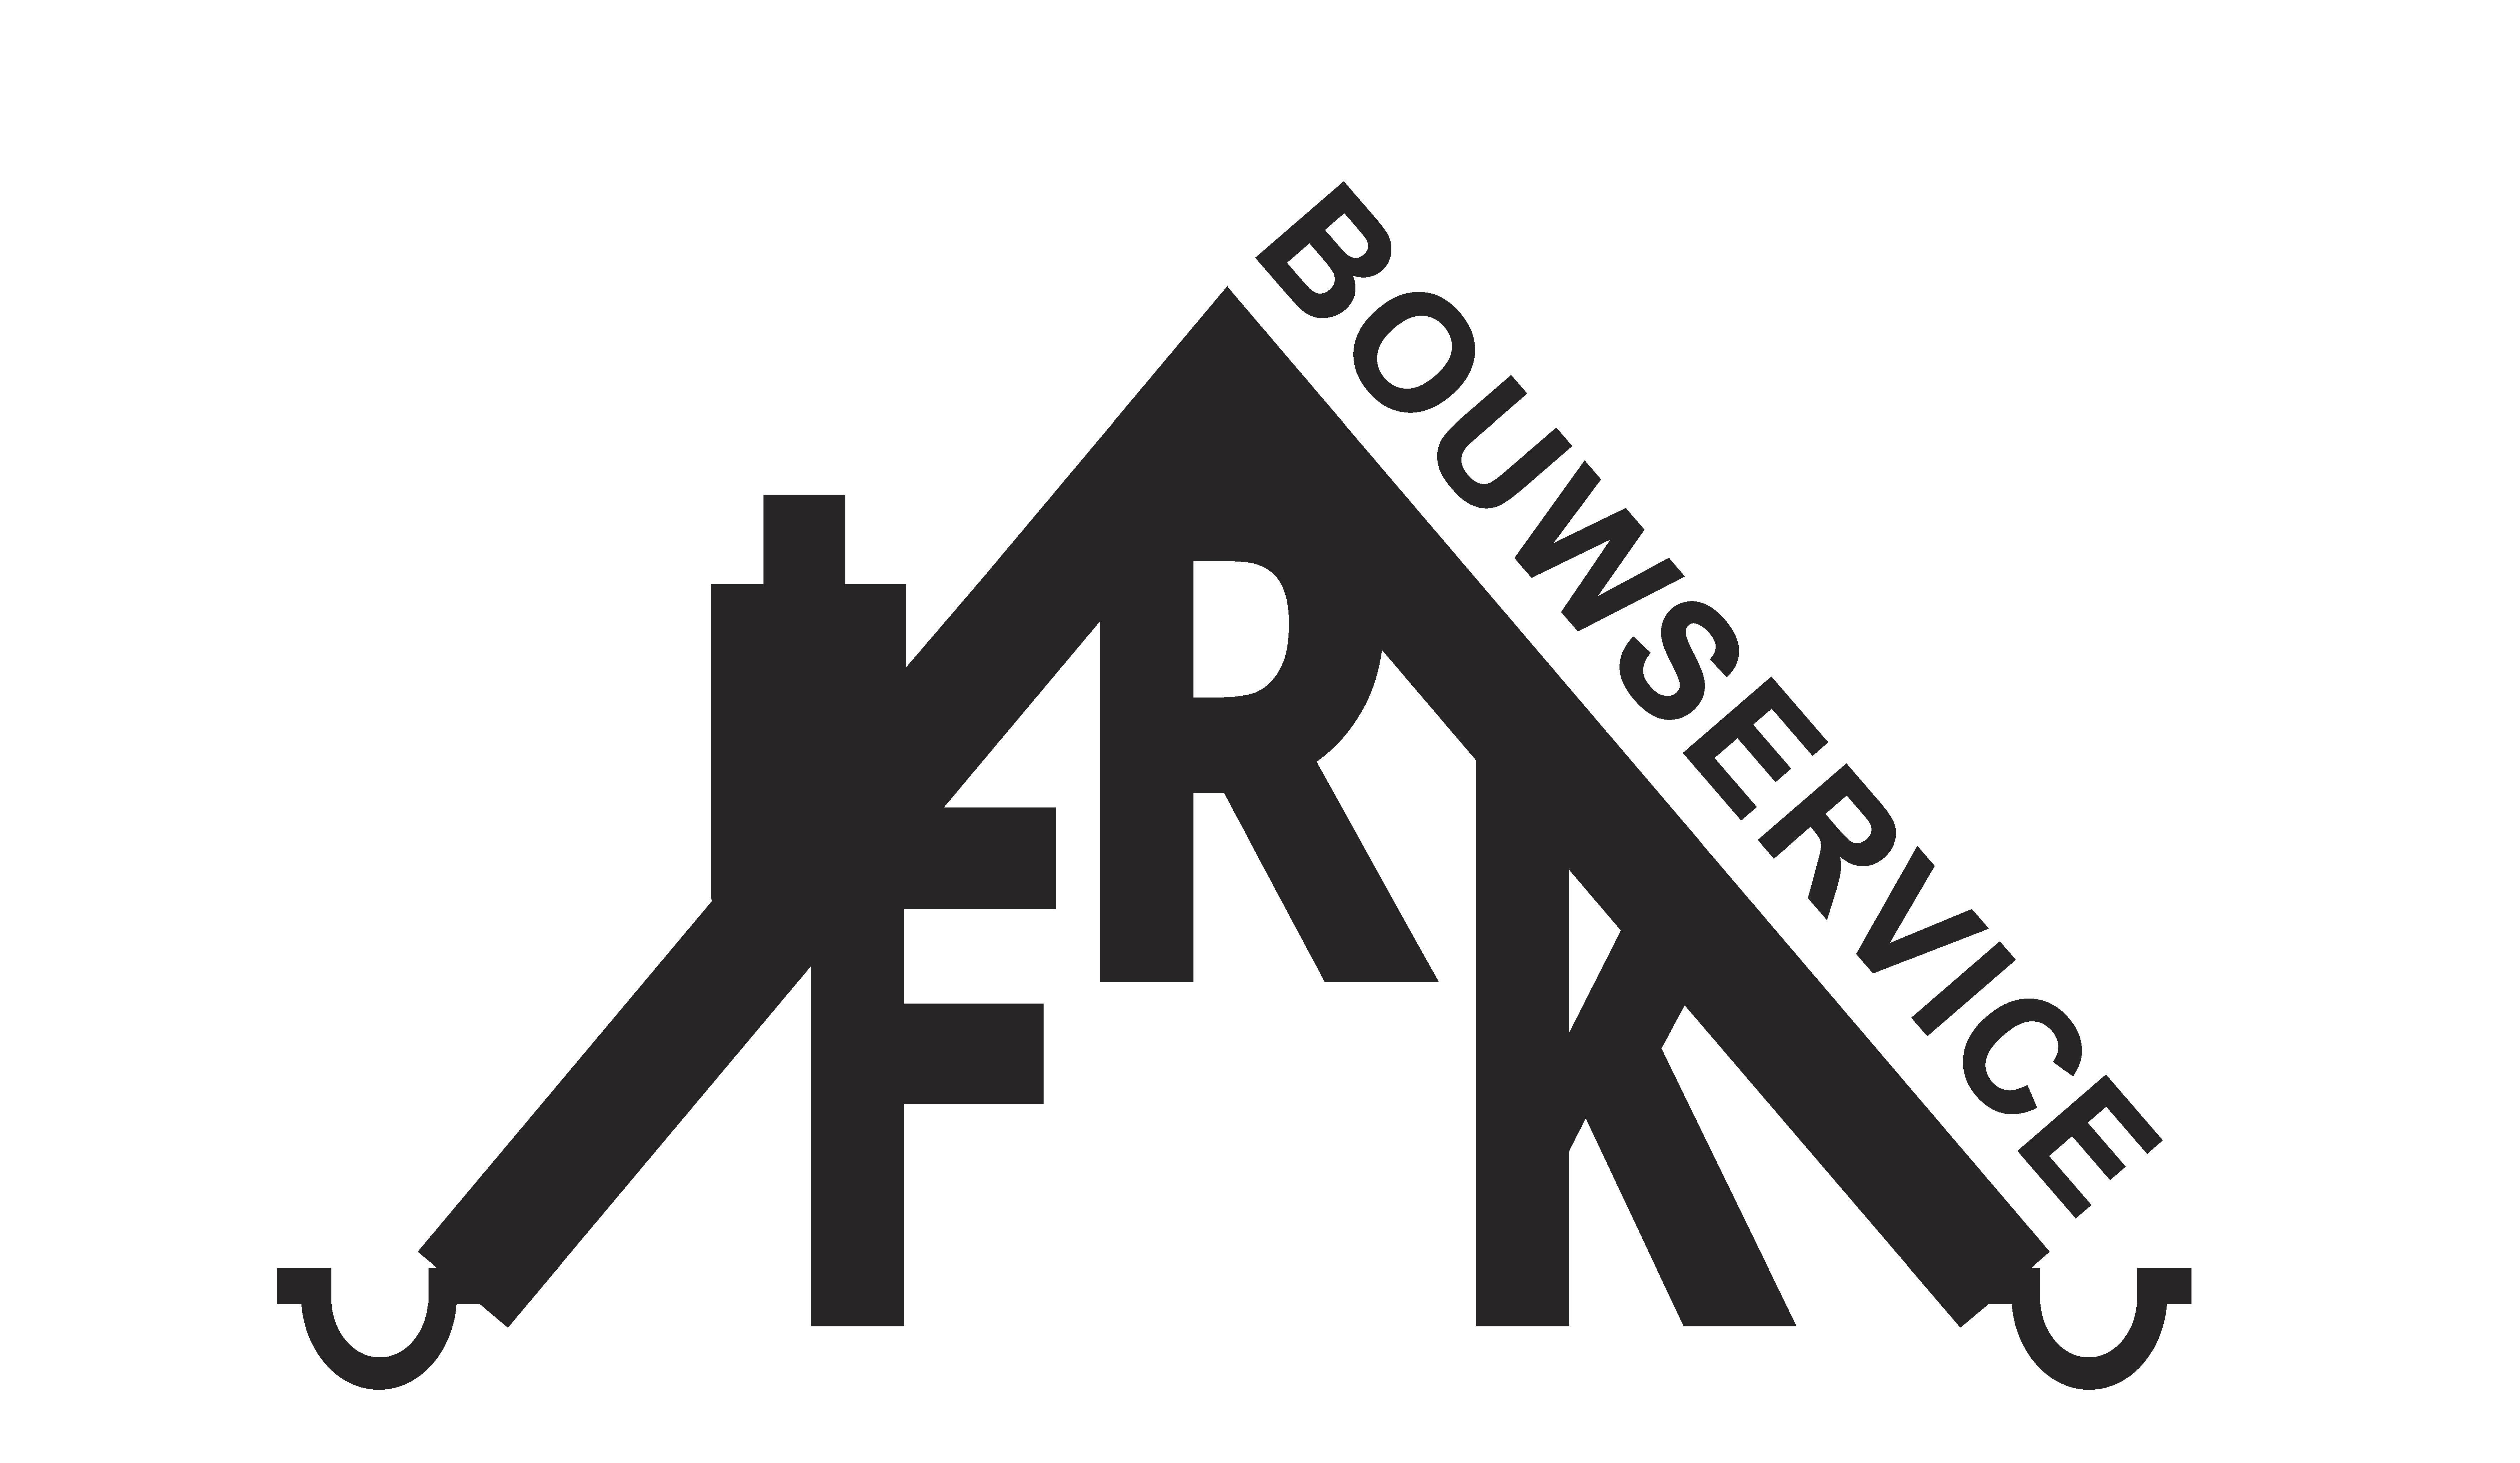 FRK Bouwservice